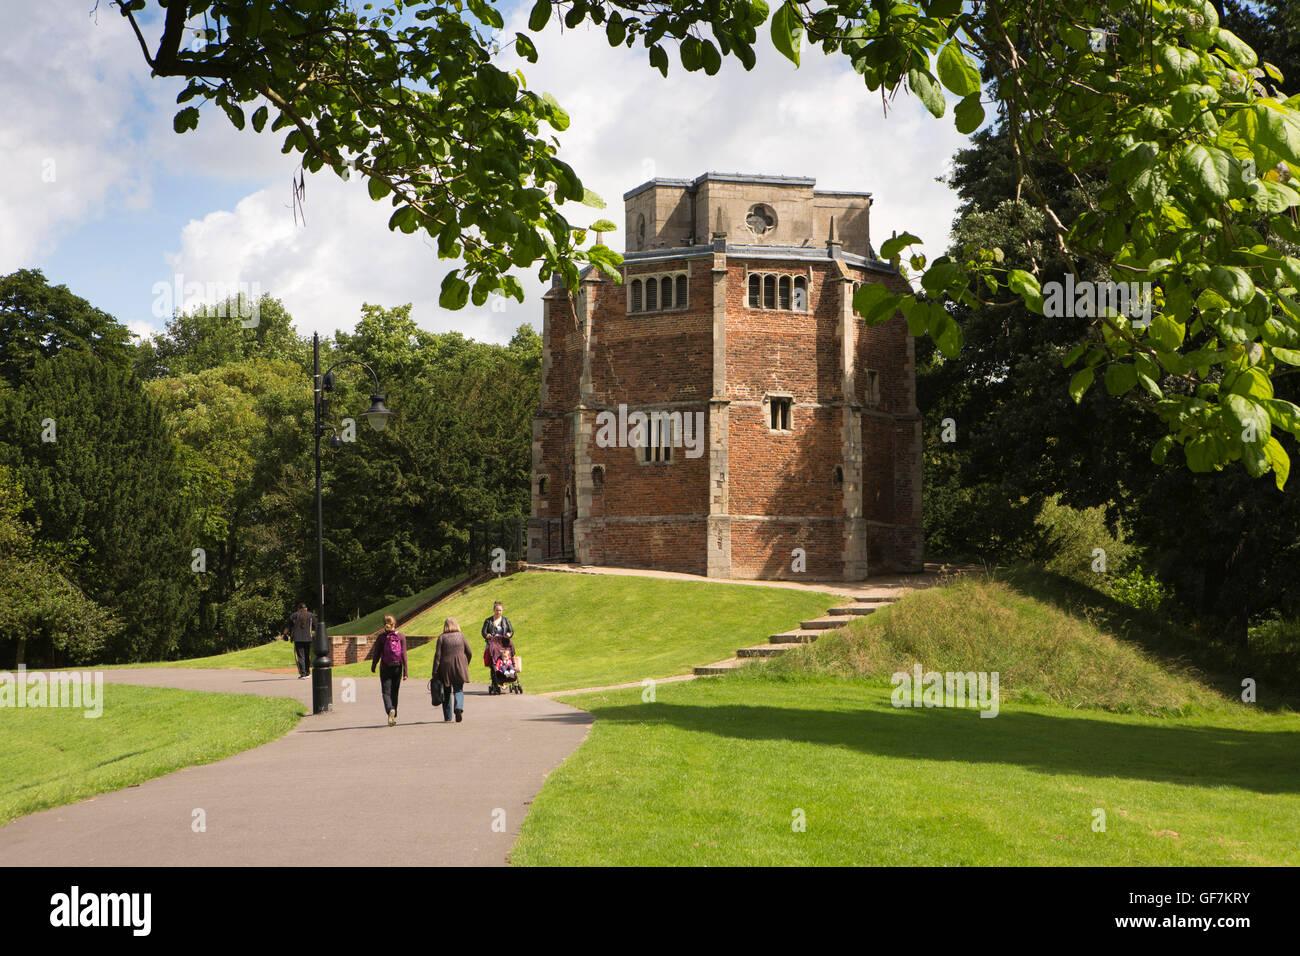 UK, England, Norfolk, King's Lynn, The Walks public park, Red Mount Chapel C15th wayside pilgrims chapel - Stock Image